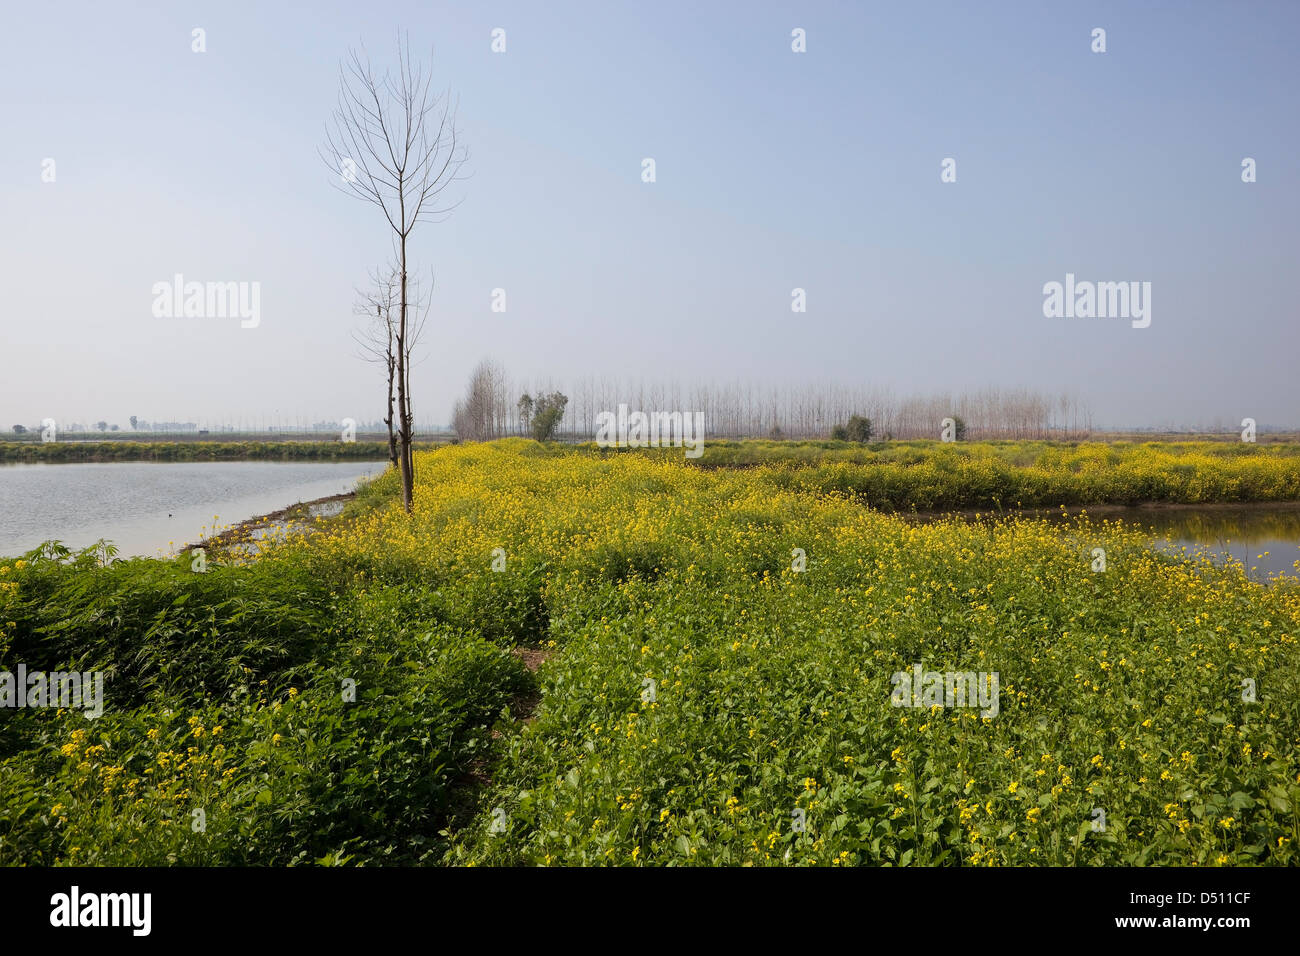 Yellow flowered mustard plants and trees growing  between lagoons at Keshopur Wetlands Punjab India - Stock Image